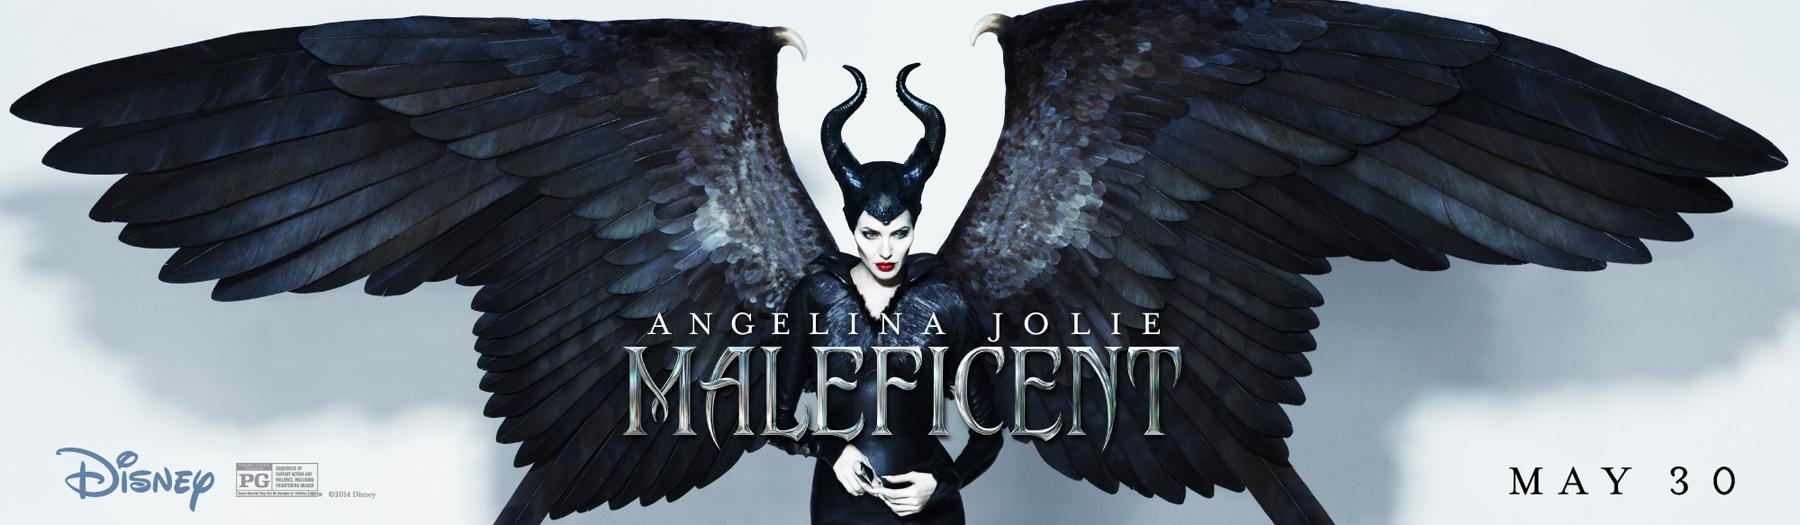 "Angelina Jolie as Disney's Maleficent ""Mistress of All Evil"""